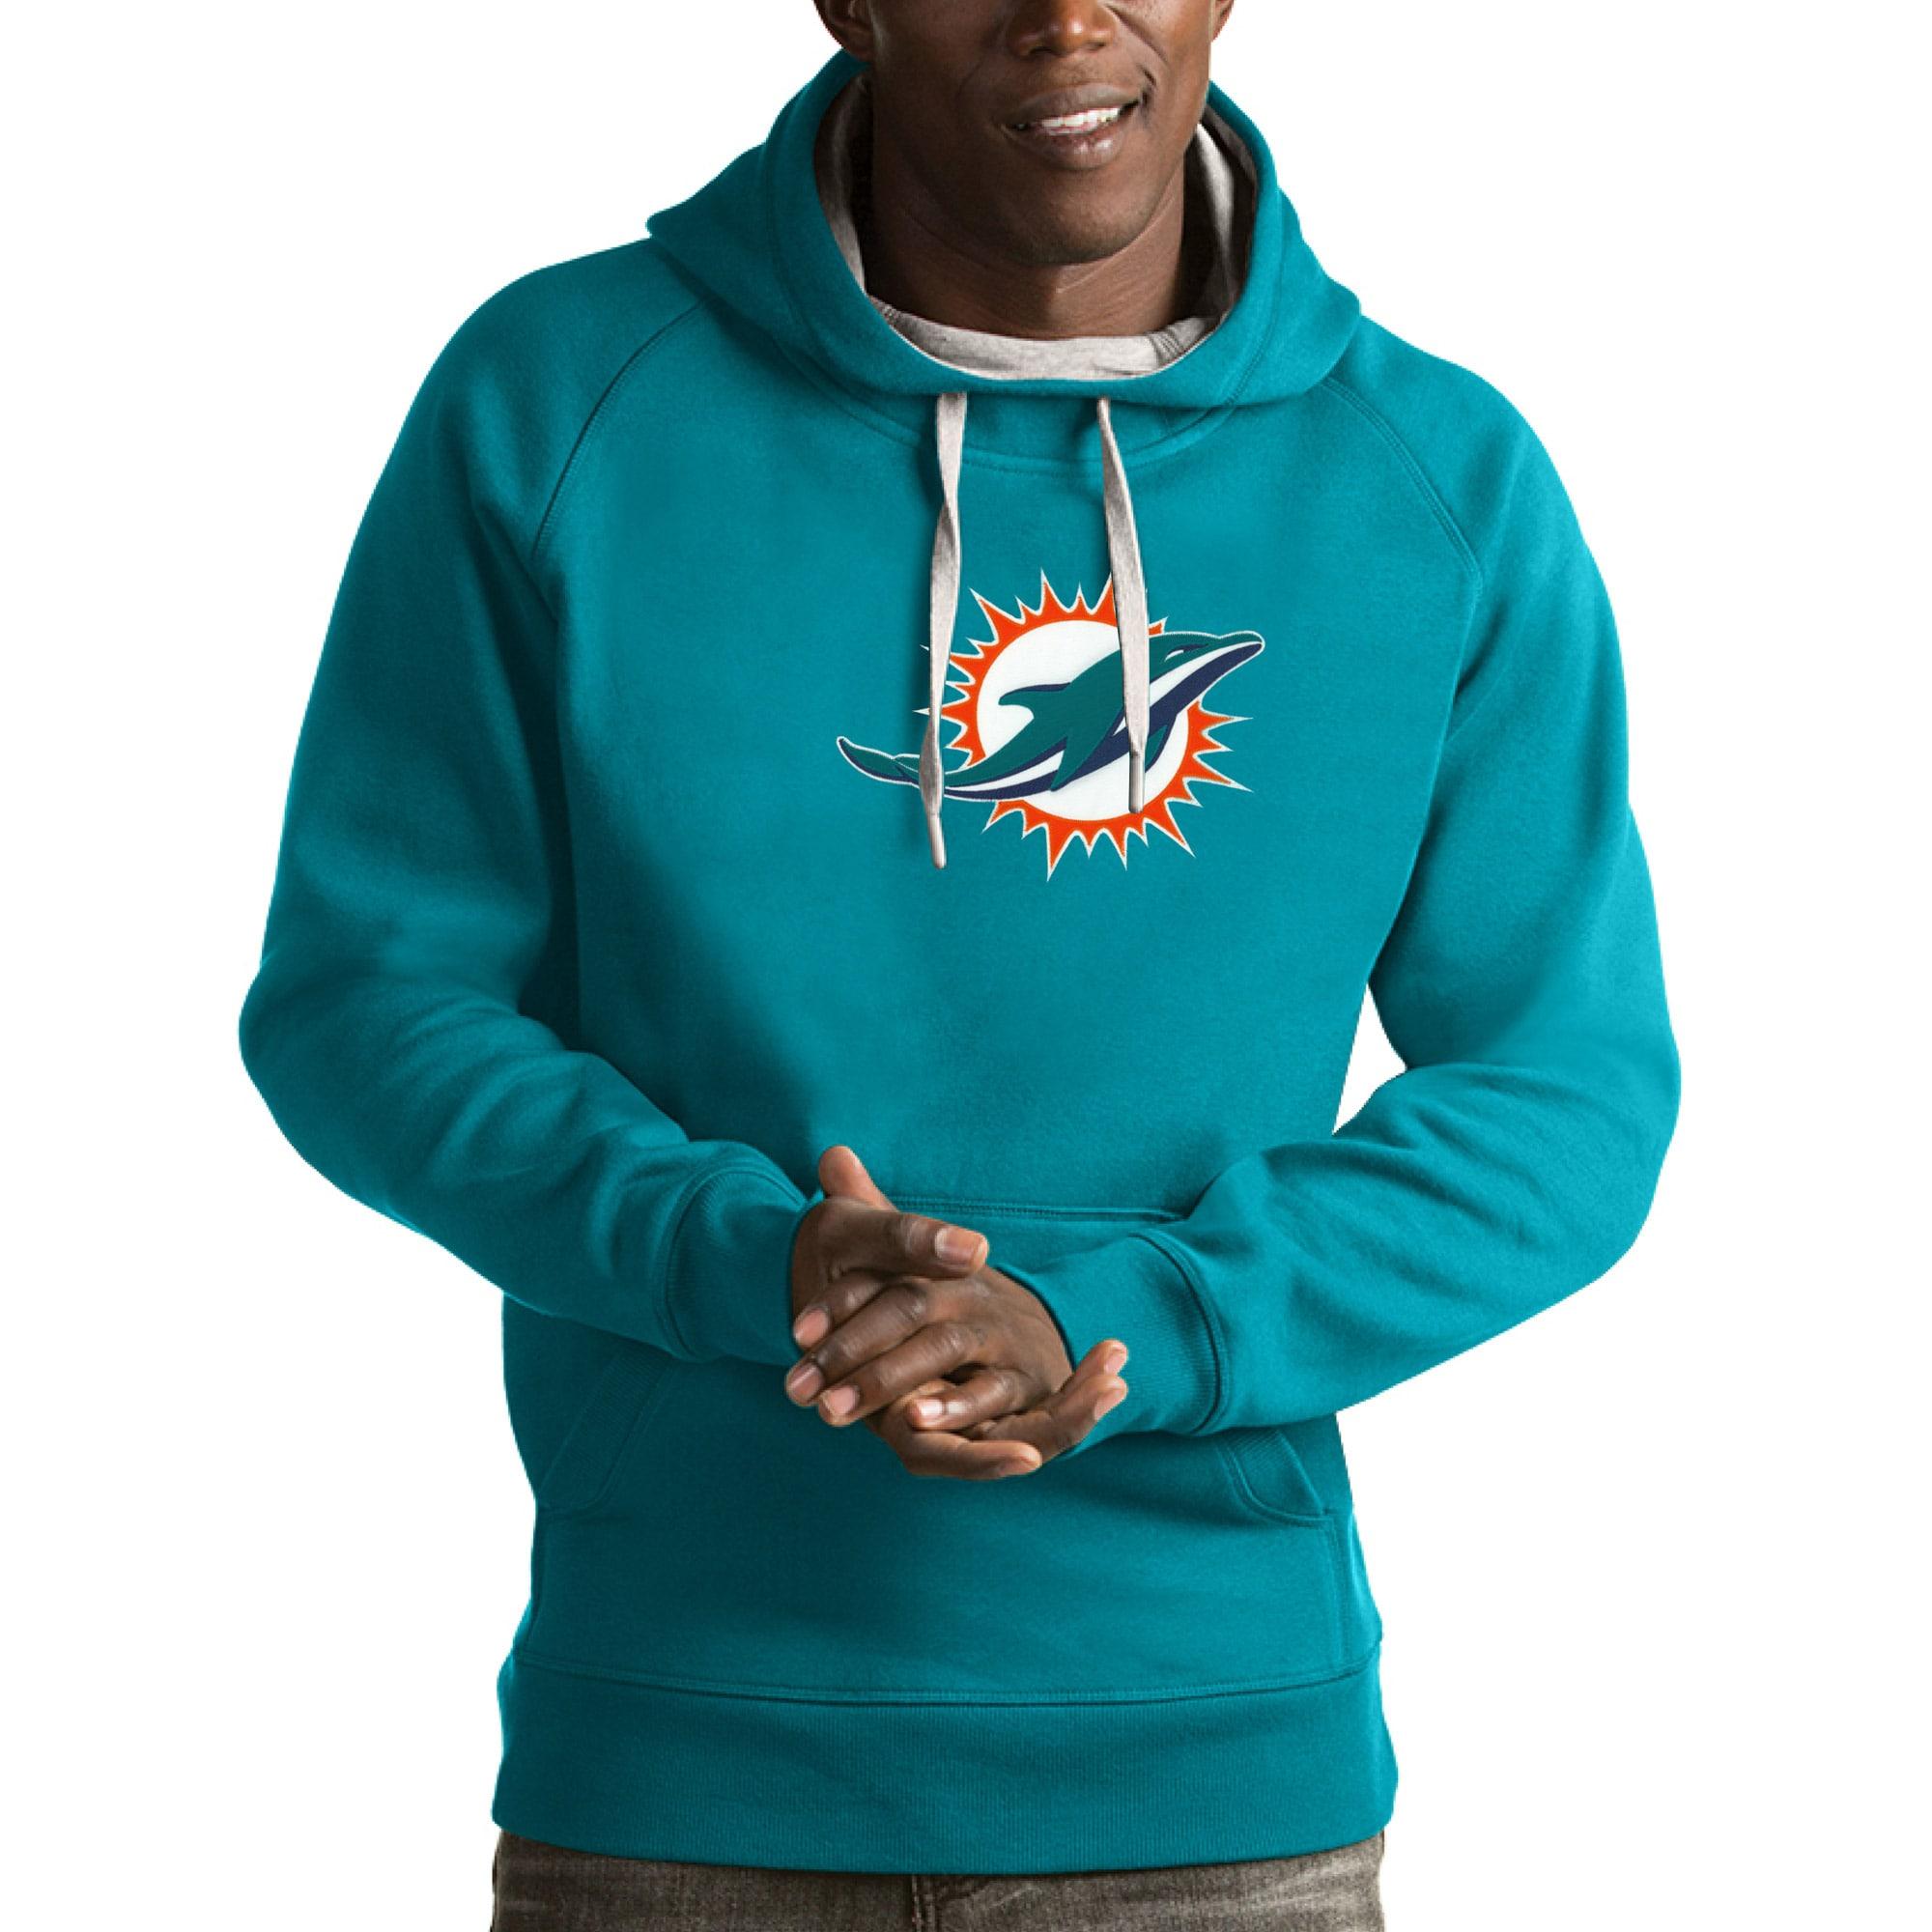 Miami Dolphins Antigua Victory Pullover Hoodie - Aqua